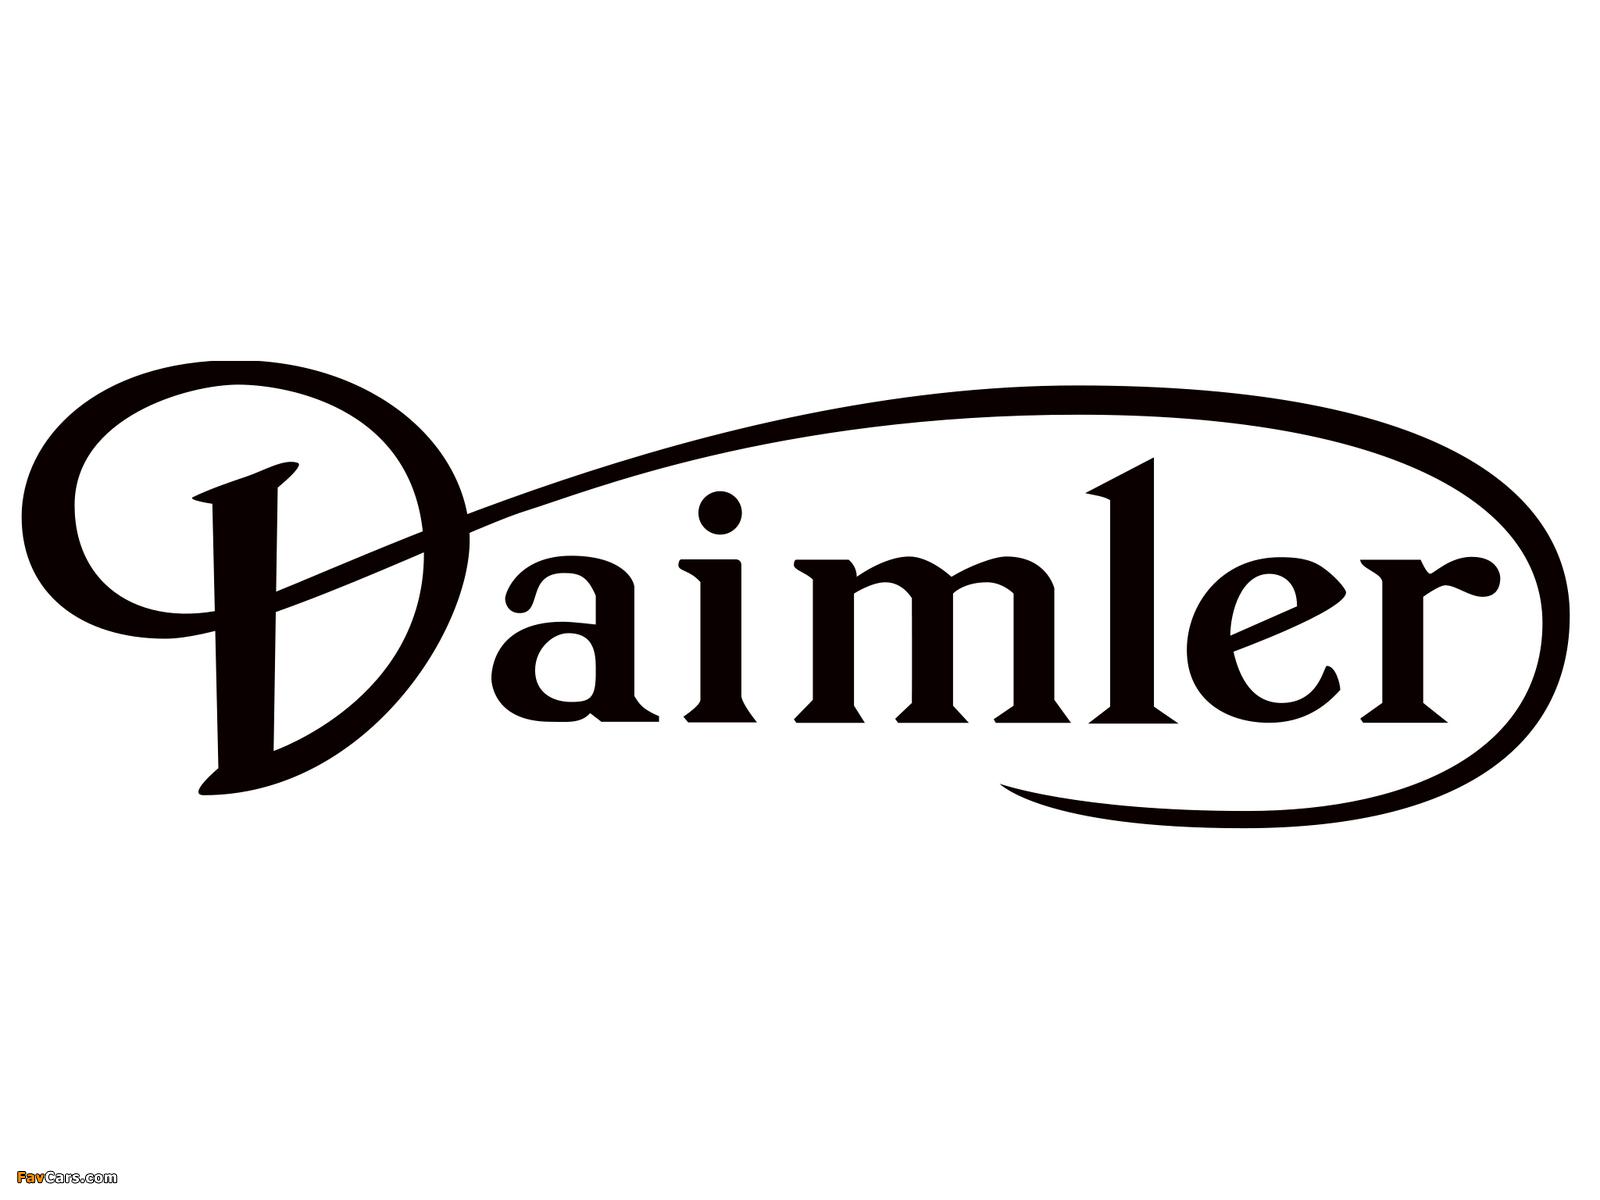 Daimler wallpapers (1600 x 1200)